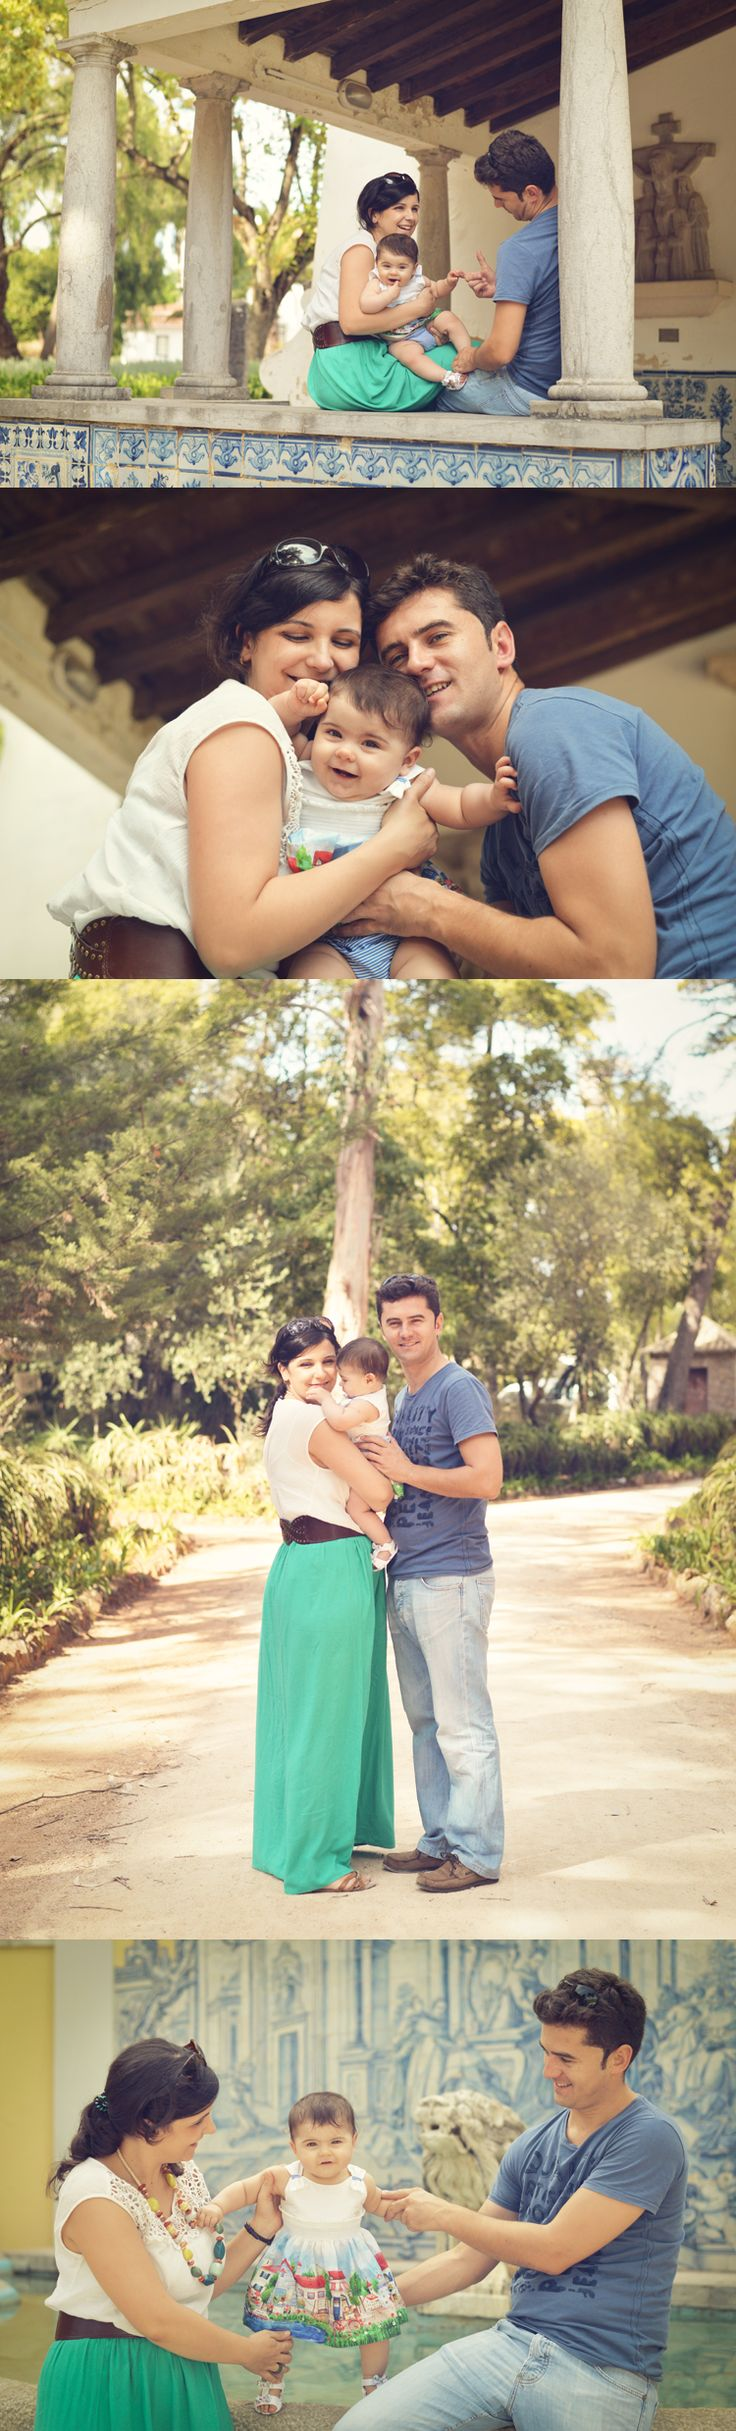 Family photoshoot // Cascais #family #familyphotoshoot #familyportrait #familyphotoshootposes #familyphotographer #lifestylephotography